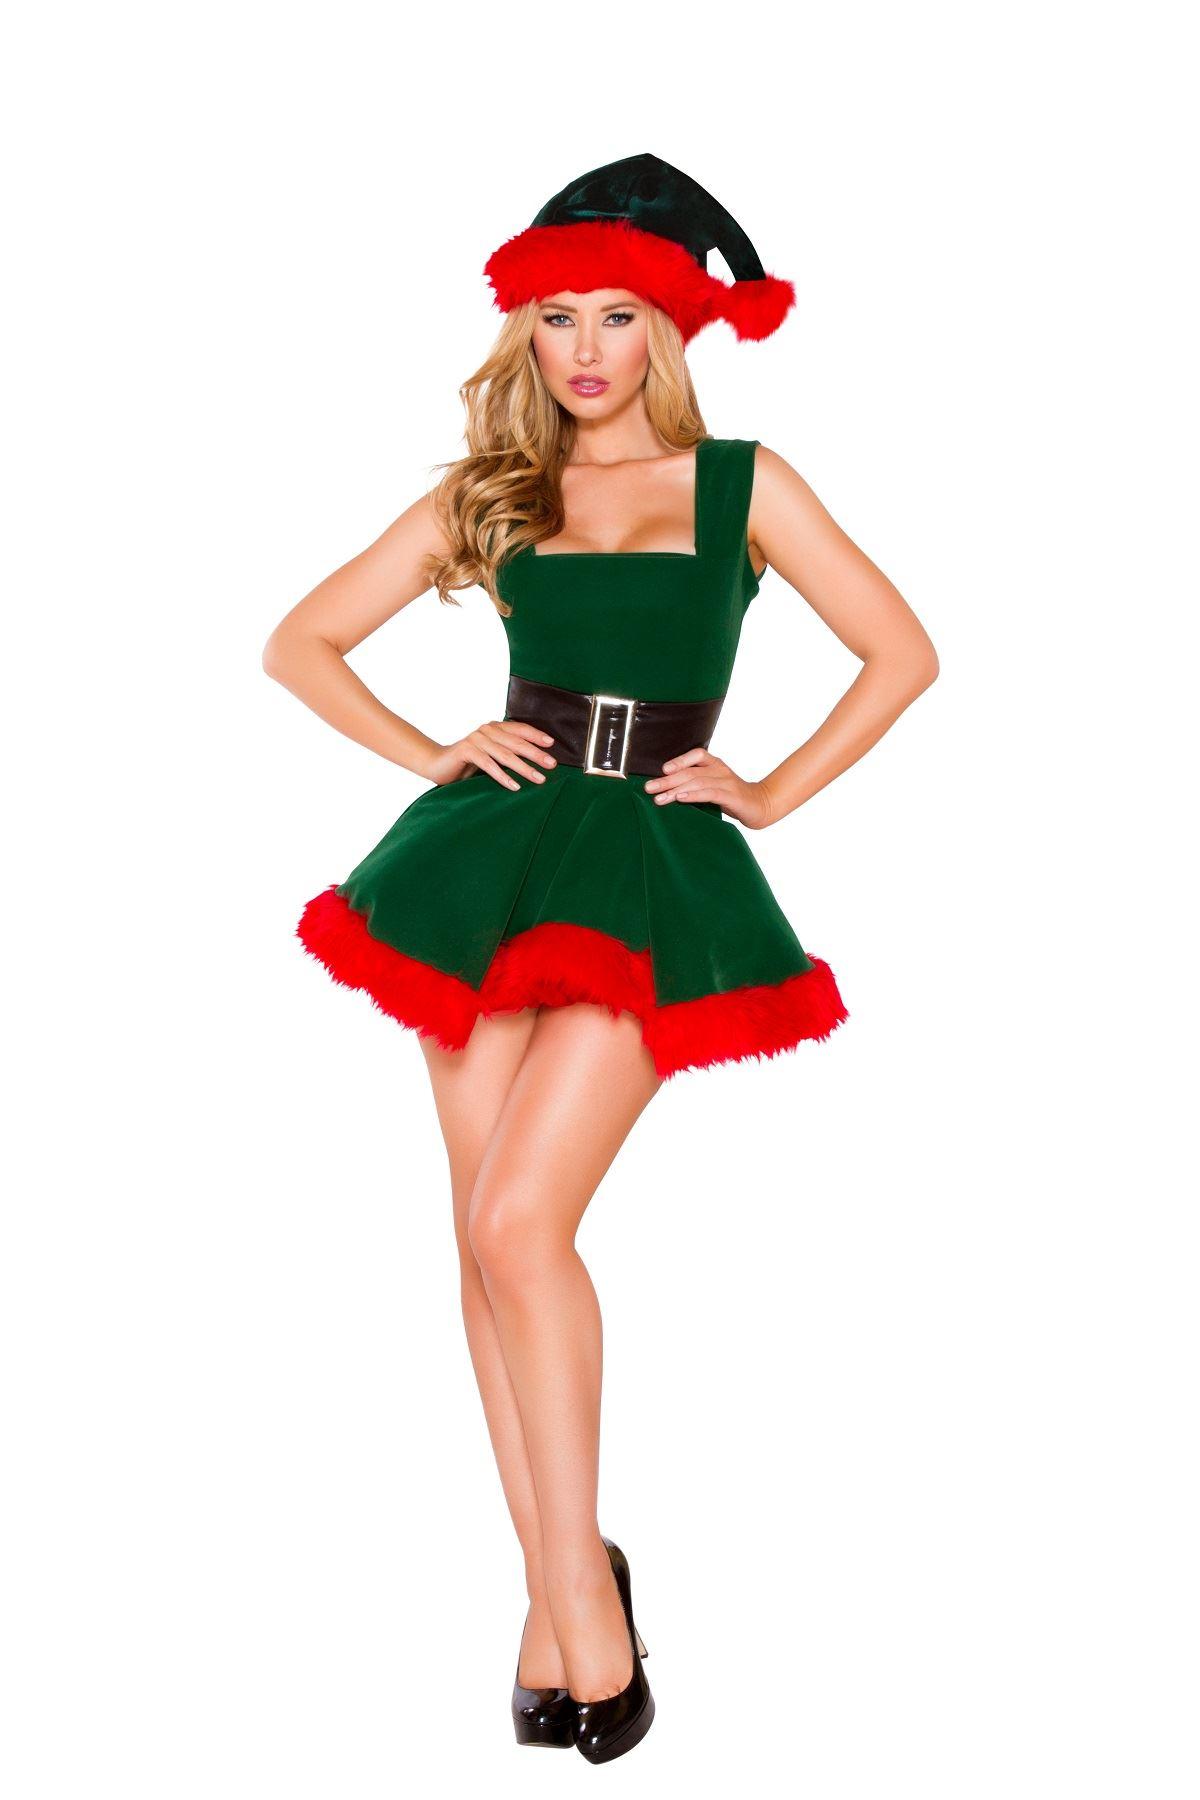 Adult Elf Woman Costume ...  sc 1 st  The Costume Land & Adult Elf Woman Costume   $87.99   The Costume Land